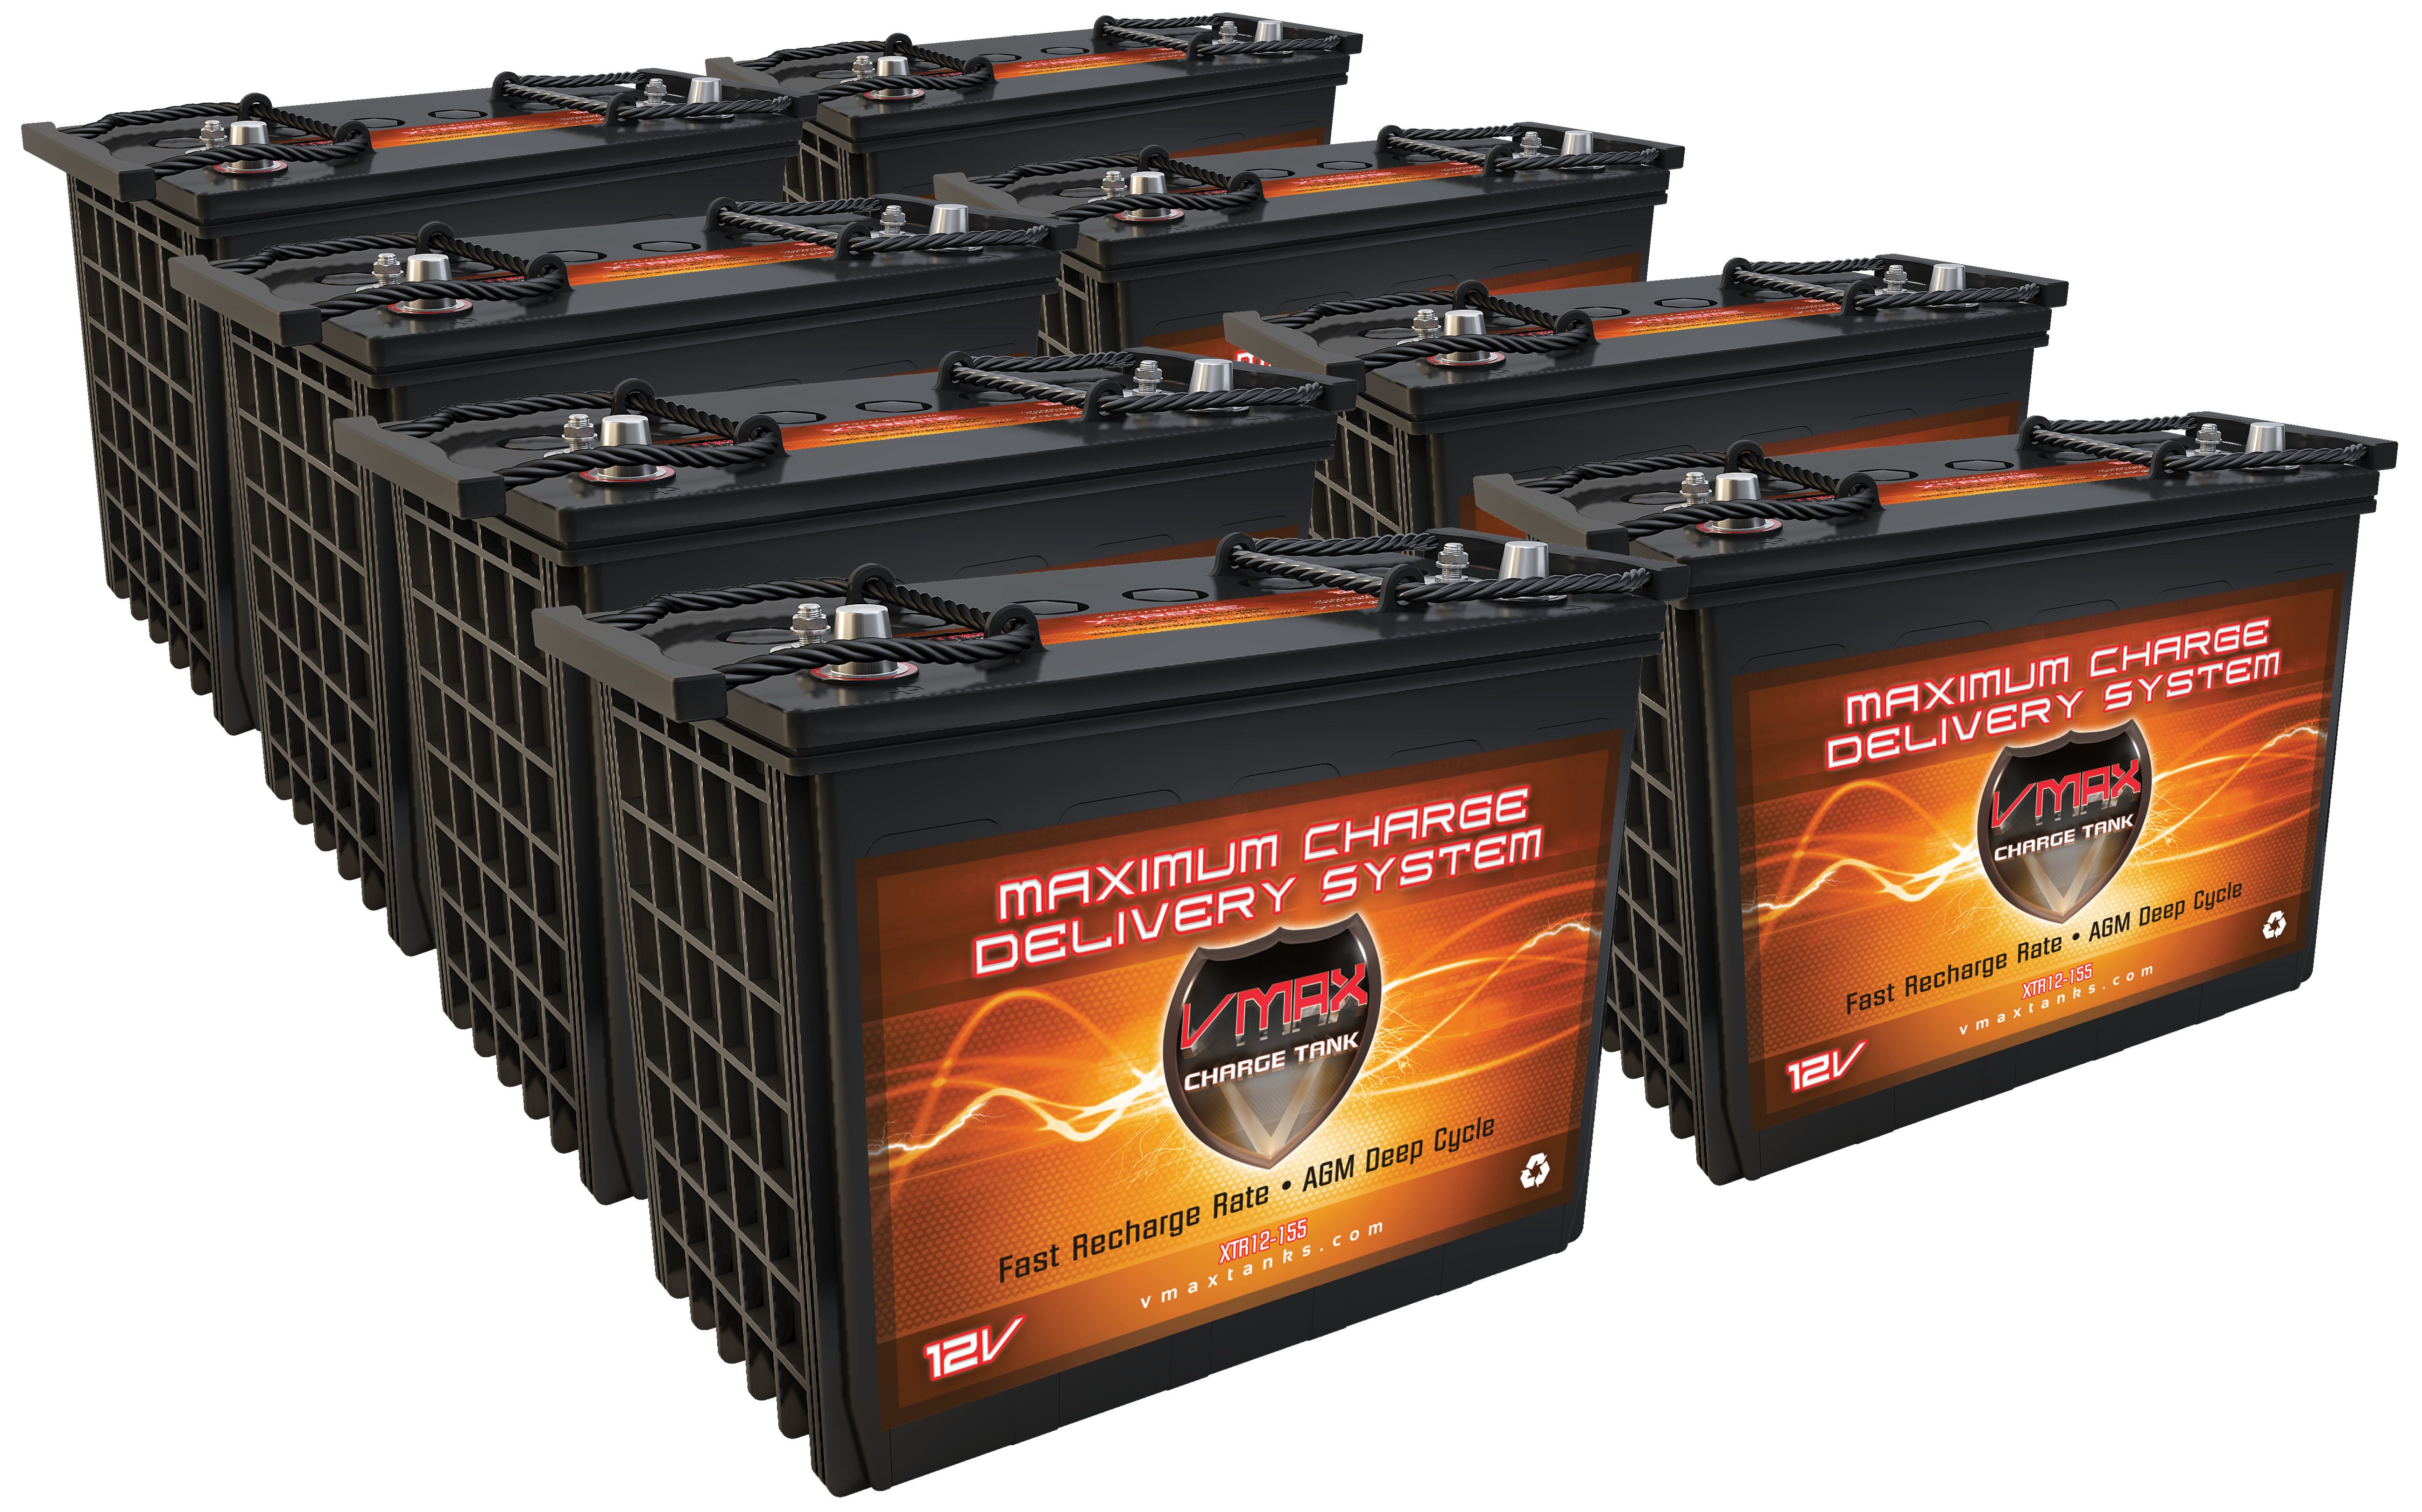 qty 8 vmax xtr12 155 12v 155ah agm sla battery upgrade for polaris ev ranger free shipping. Black Bedroom Furniture Sets. Home Design Ideas